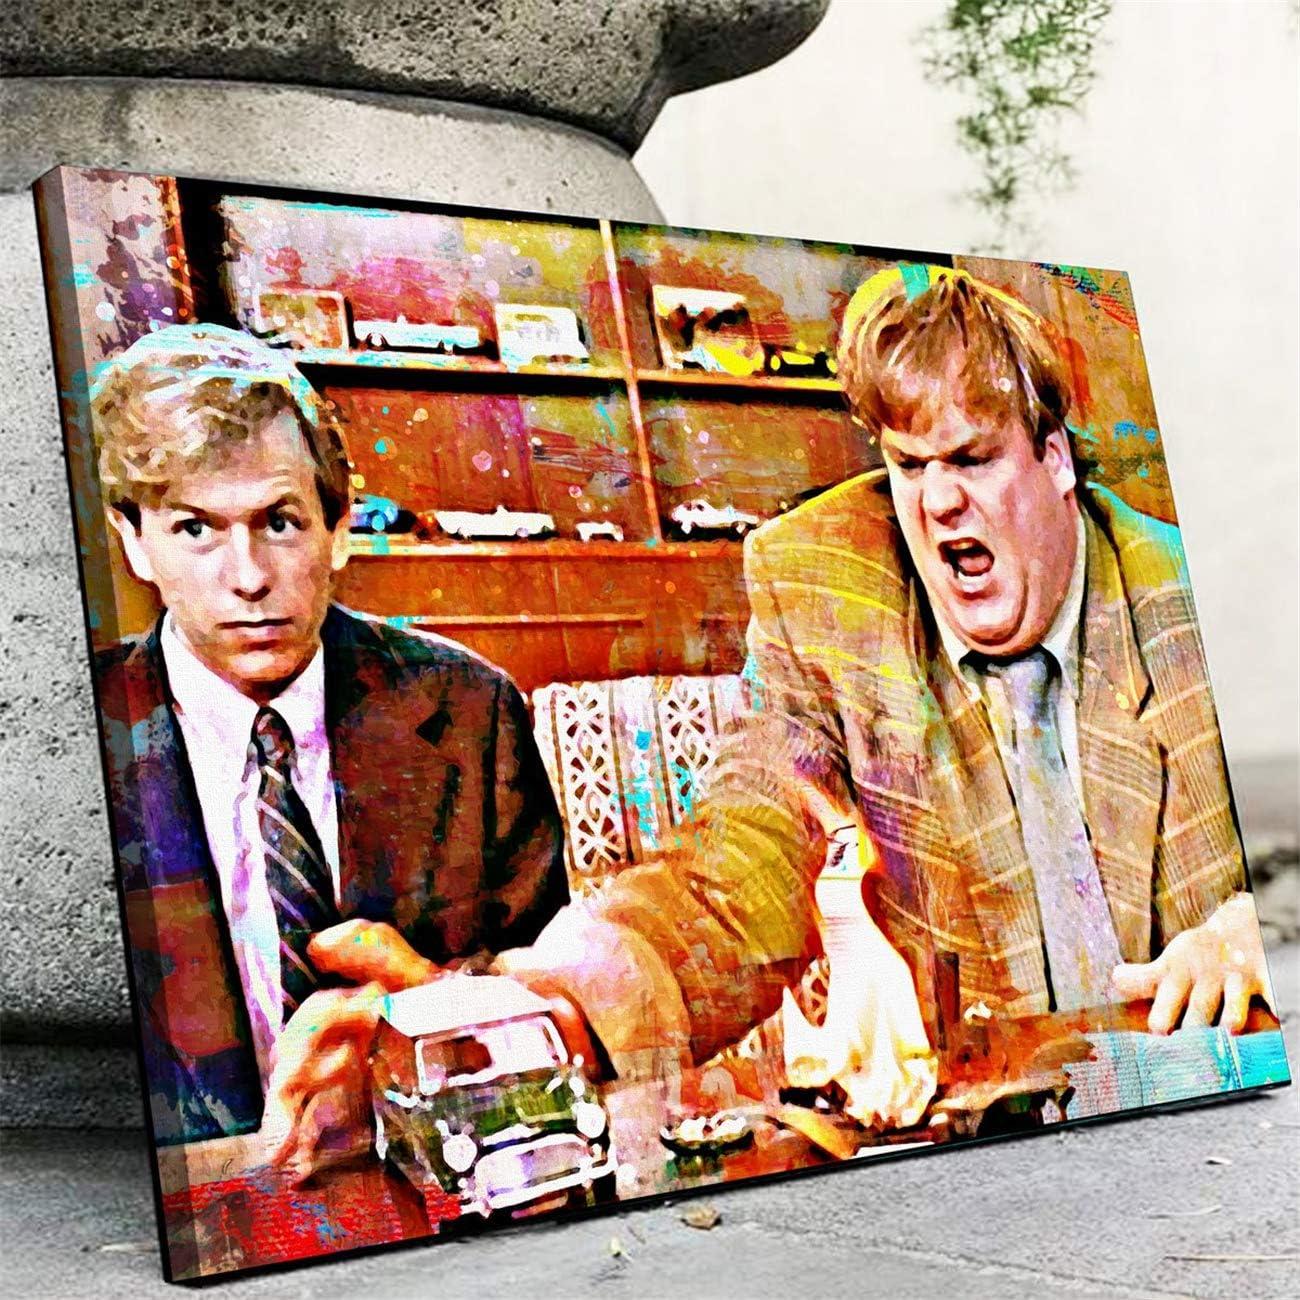 Max 67% OFF NATVVA Wall Gifts Art Callahan Sales Decor Movie Poster Viv Pitch